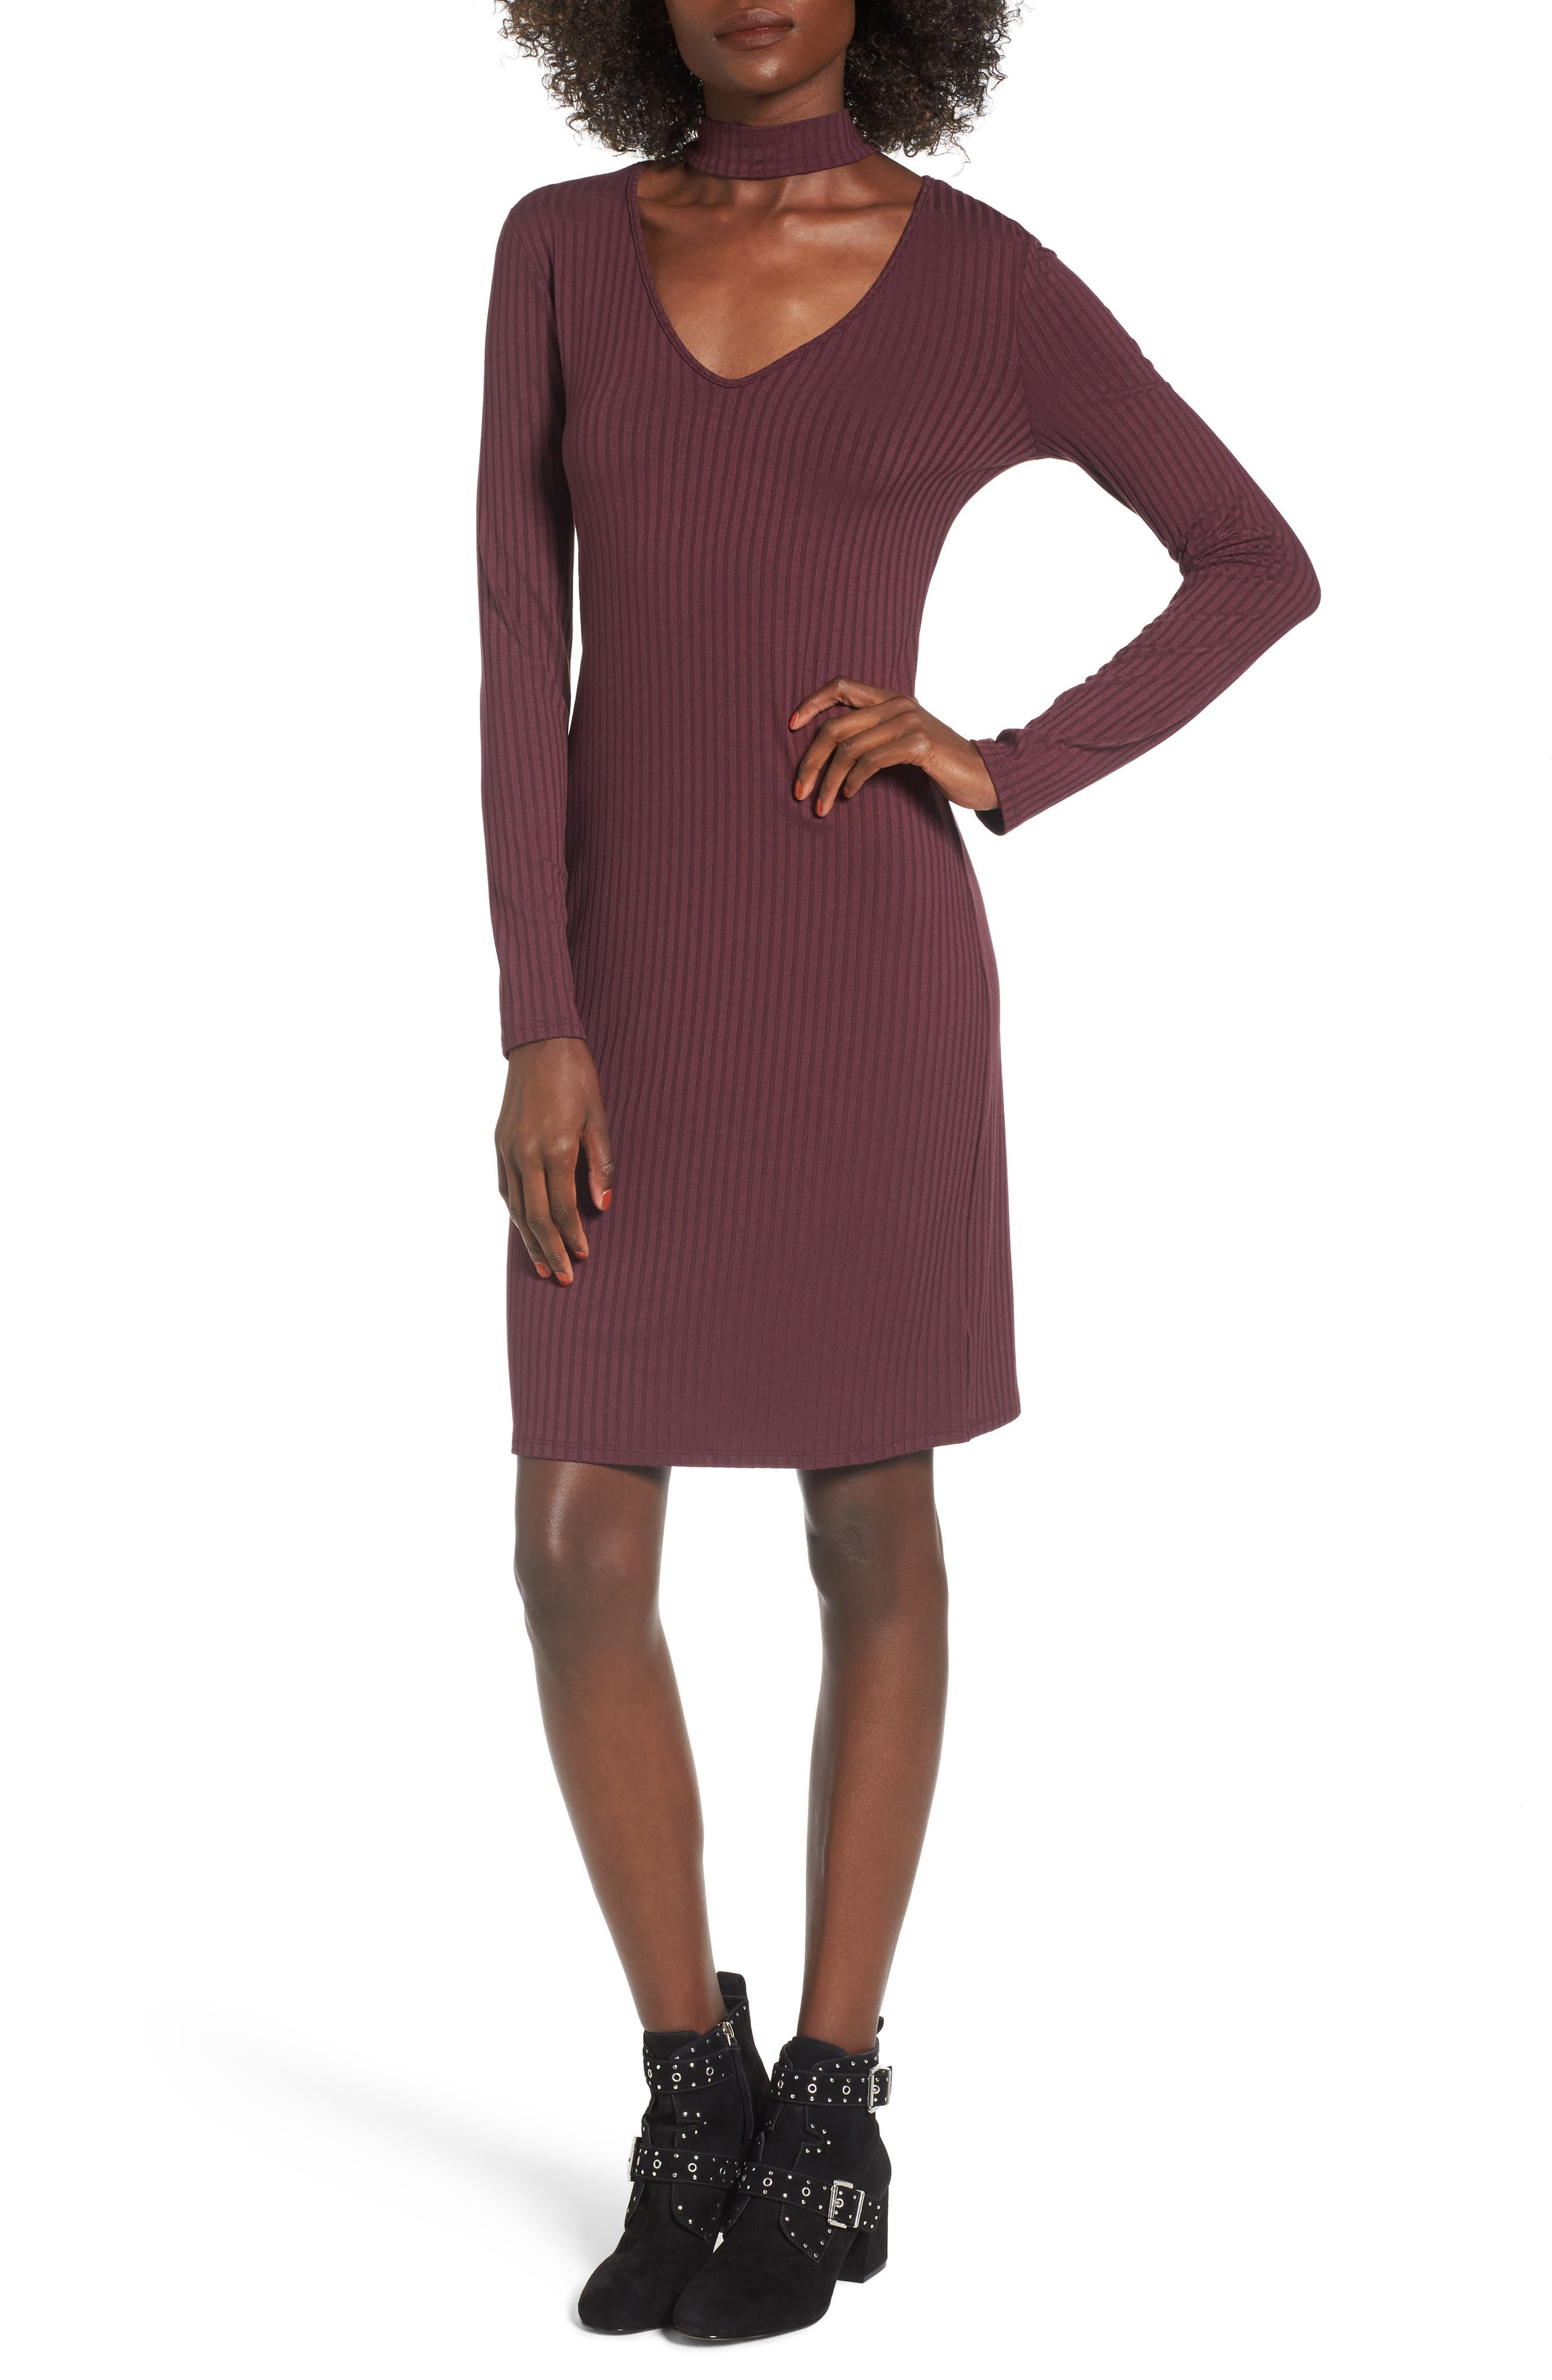 Main Image - One Clothing Ribbed Choker Dress